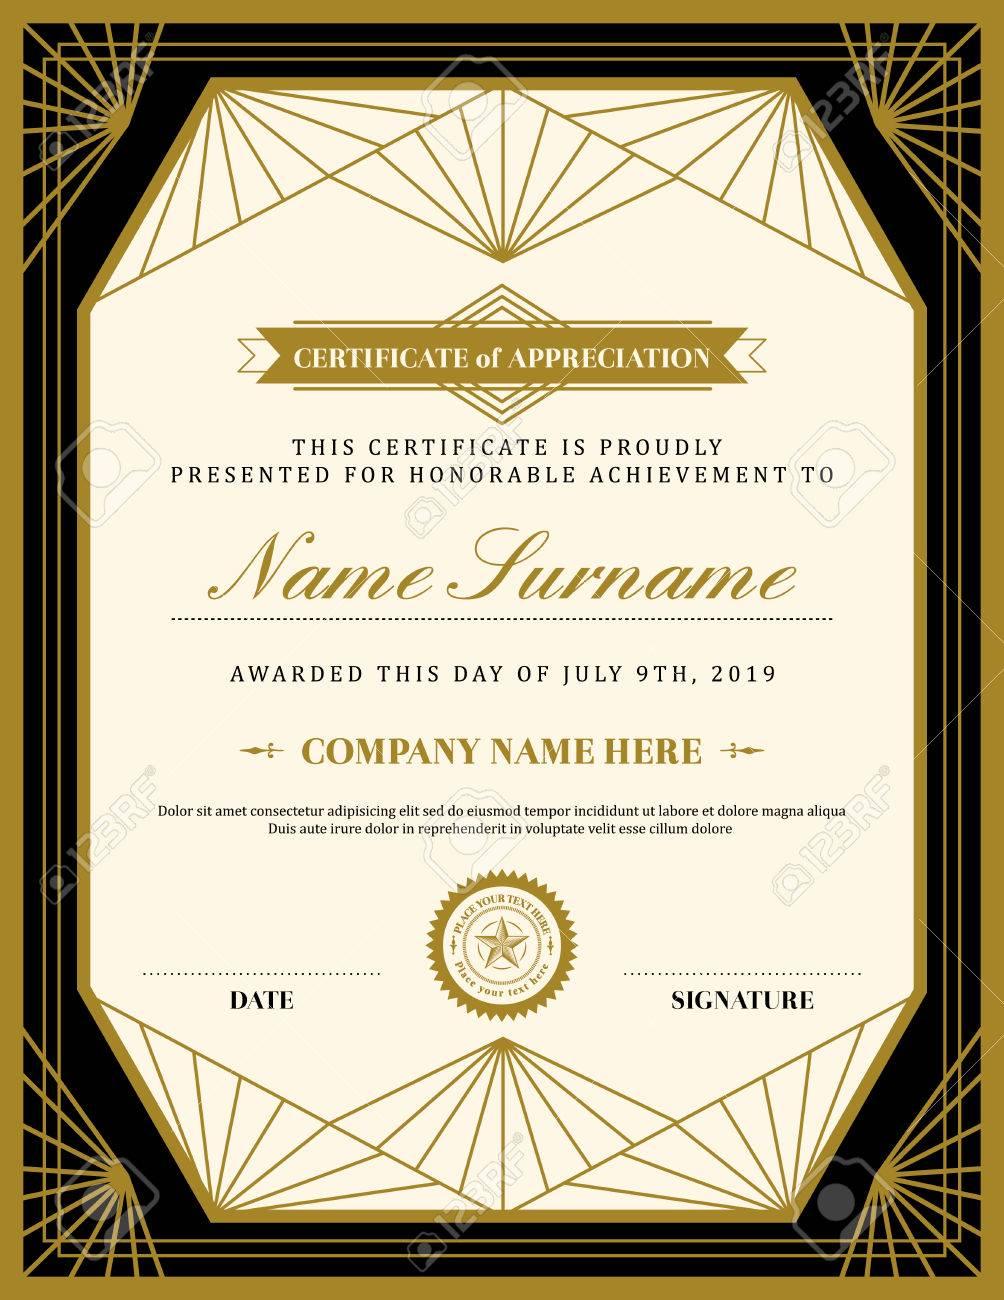 Vintage retro art deco frame certificate background design vintage retro art deco frame certificate background design template stock vector 50155145 yadclub Gallery